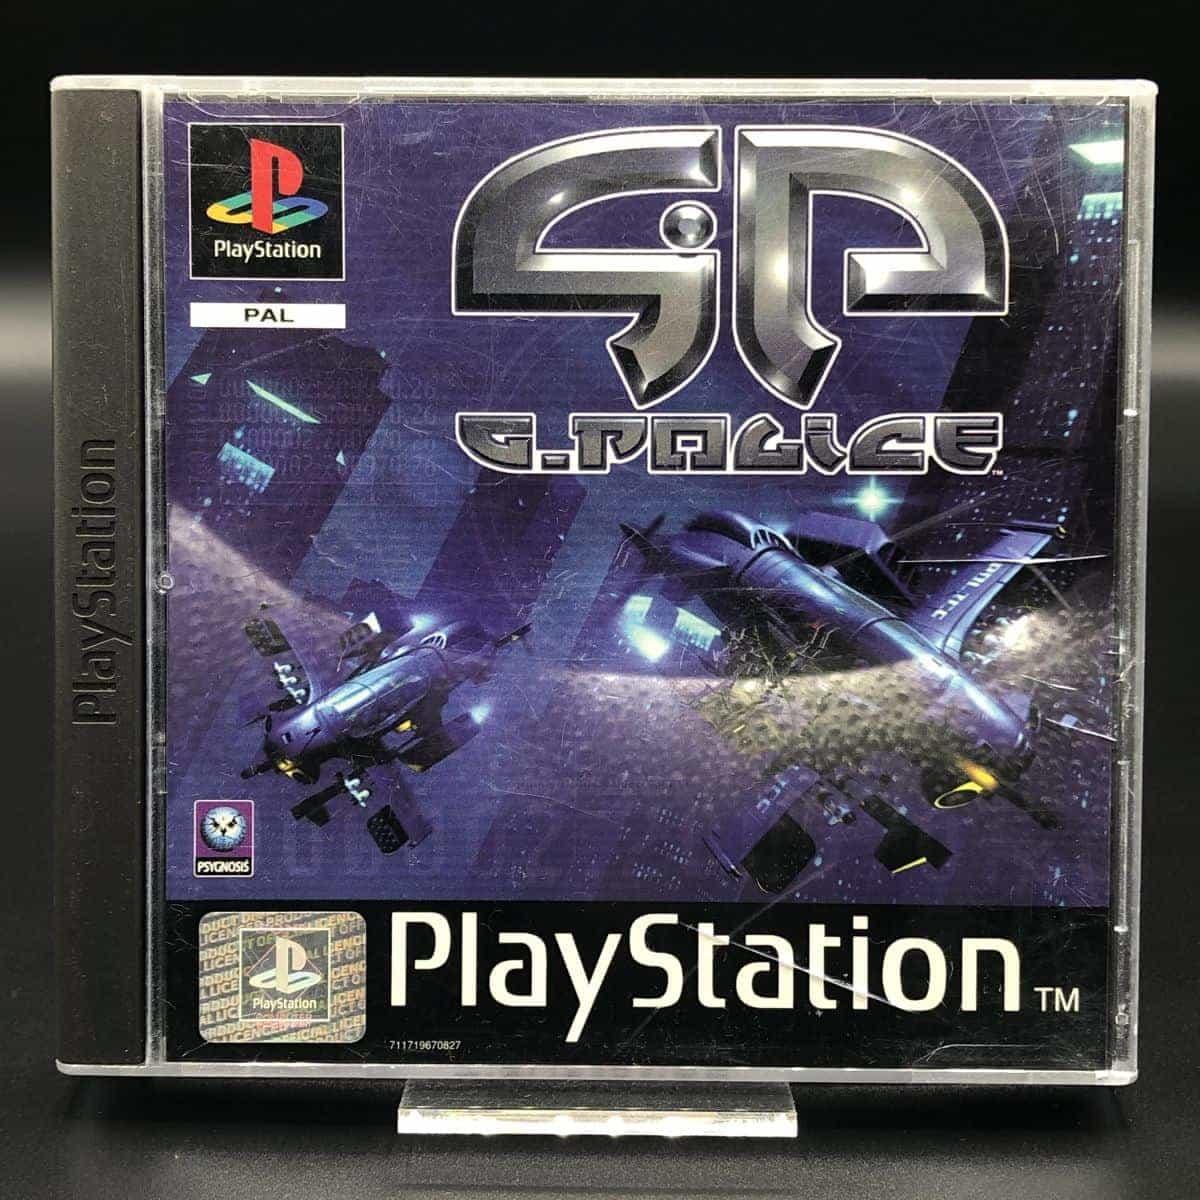 PS1 G-Police (Komplett) (Gebrauchsspuren) Sony PlayStation 1